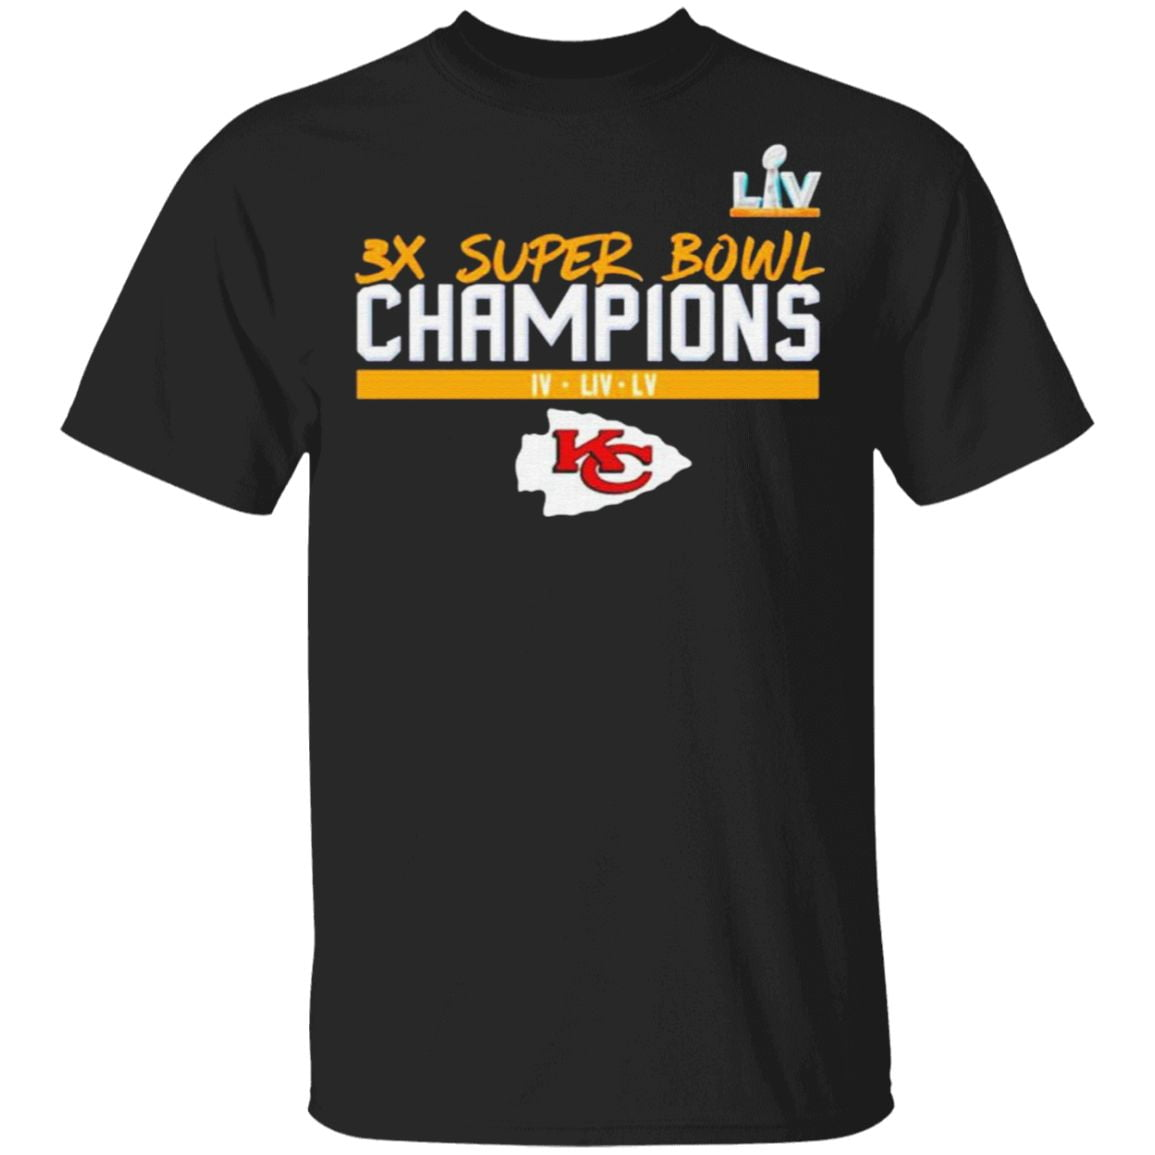 kansas city chiefs 3x super bowl champions Shirt